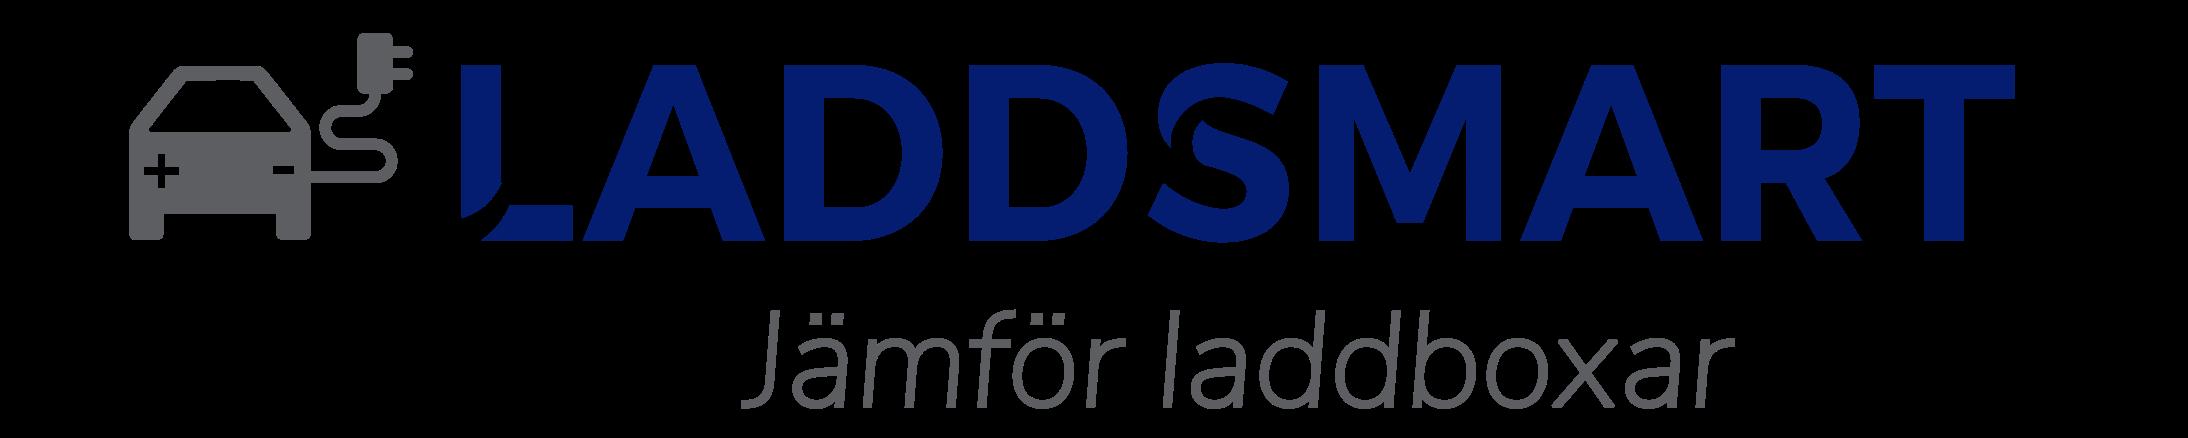 Laddsmart-logotyp-2021